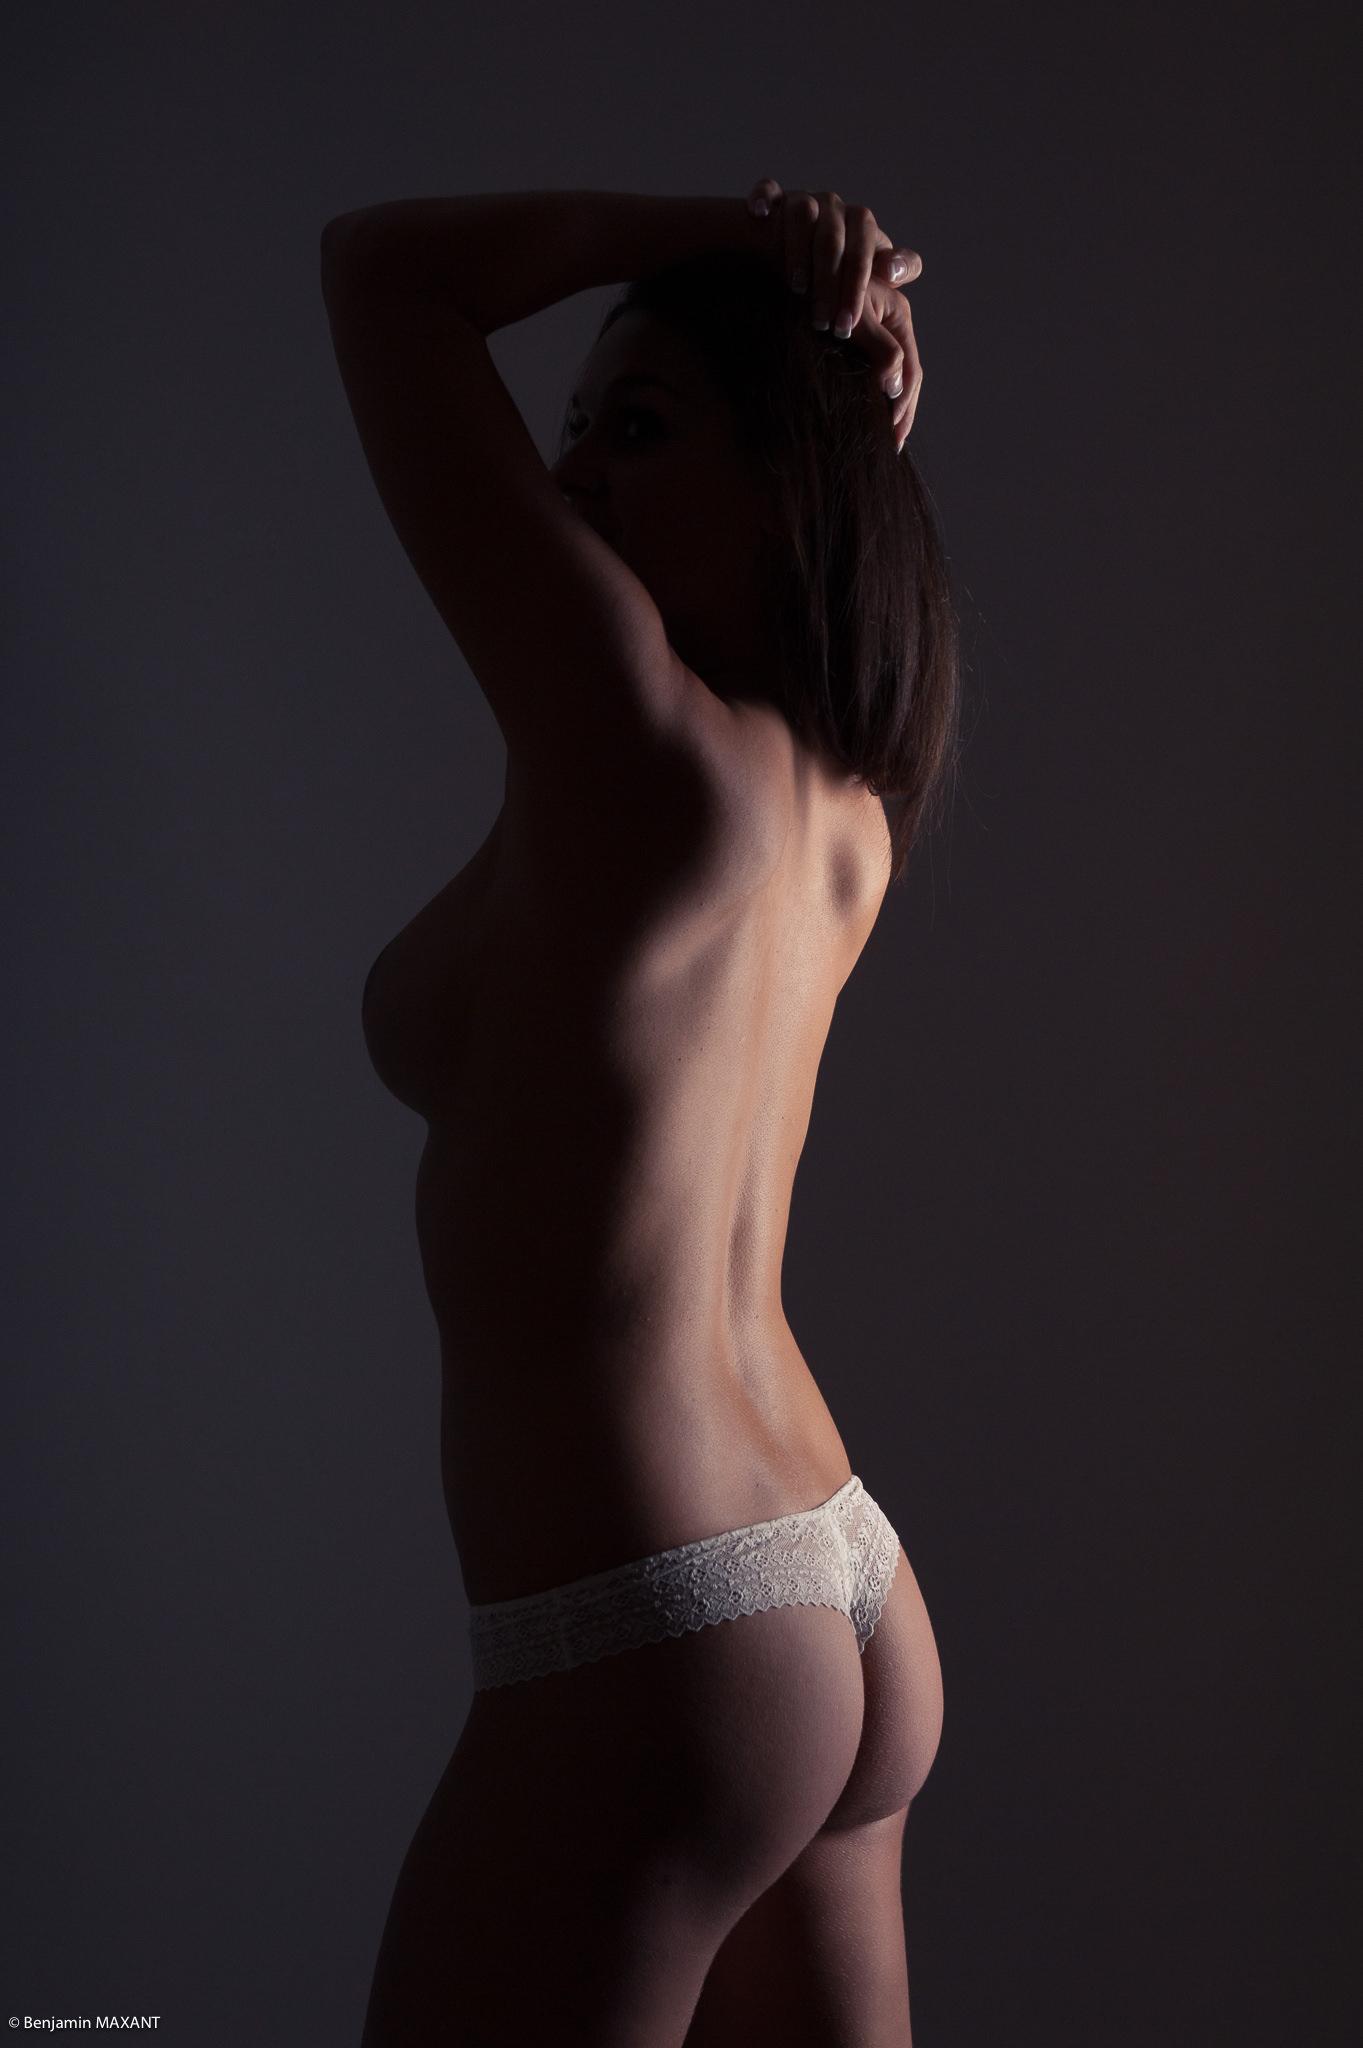 Séance photo lingerie en studio topless en string blanc